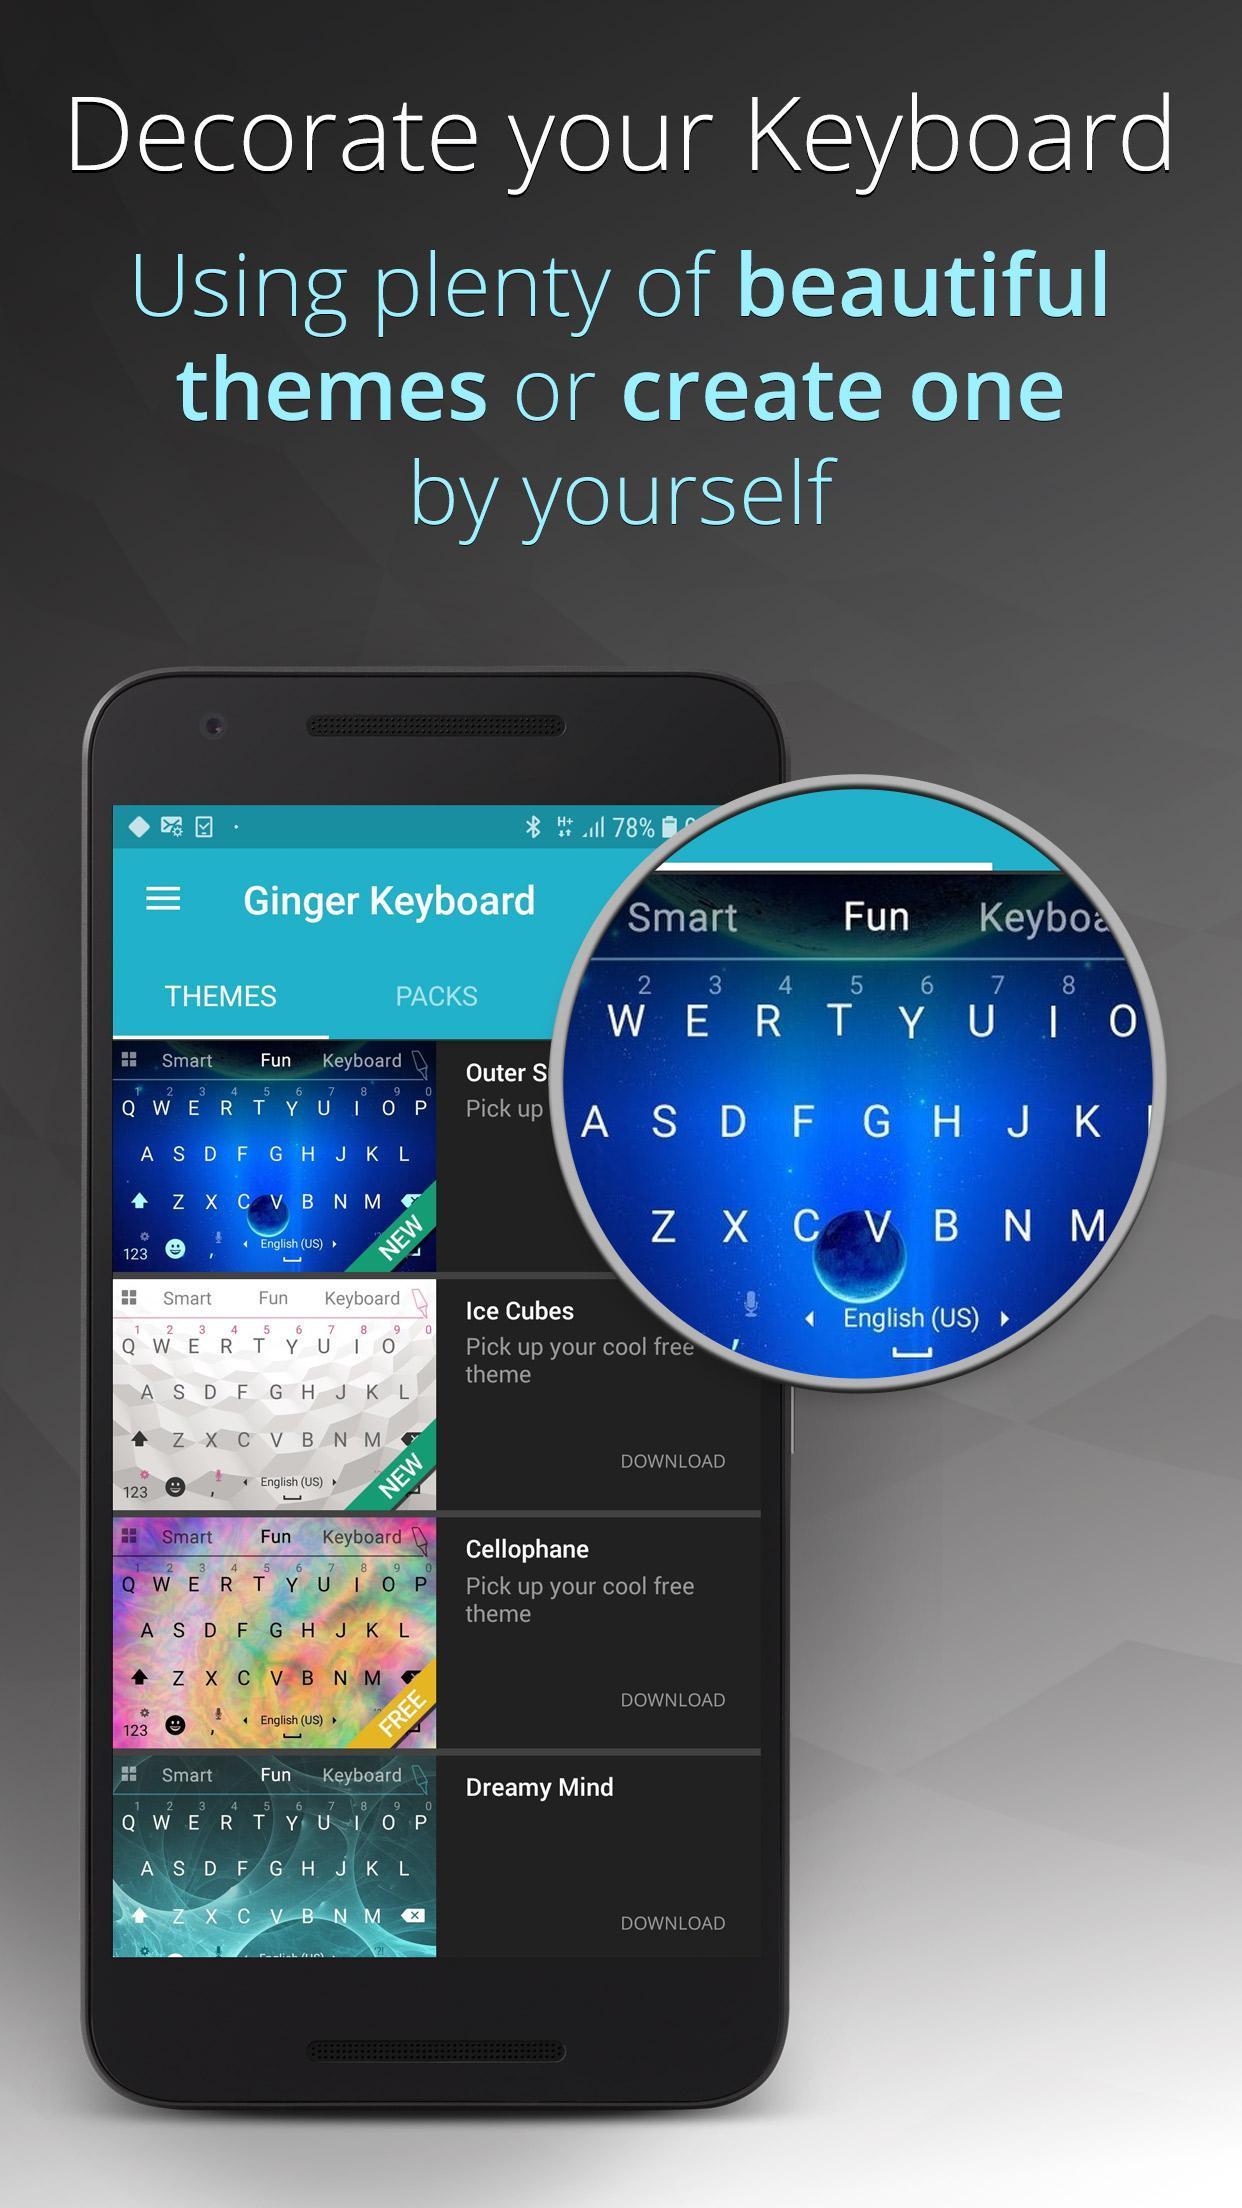 Ginger Keyboard Emoji, GIFs, Themes & Games 9.0.07 Screenshot 6